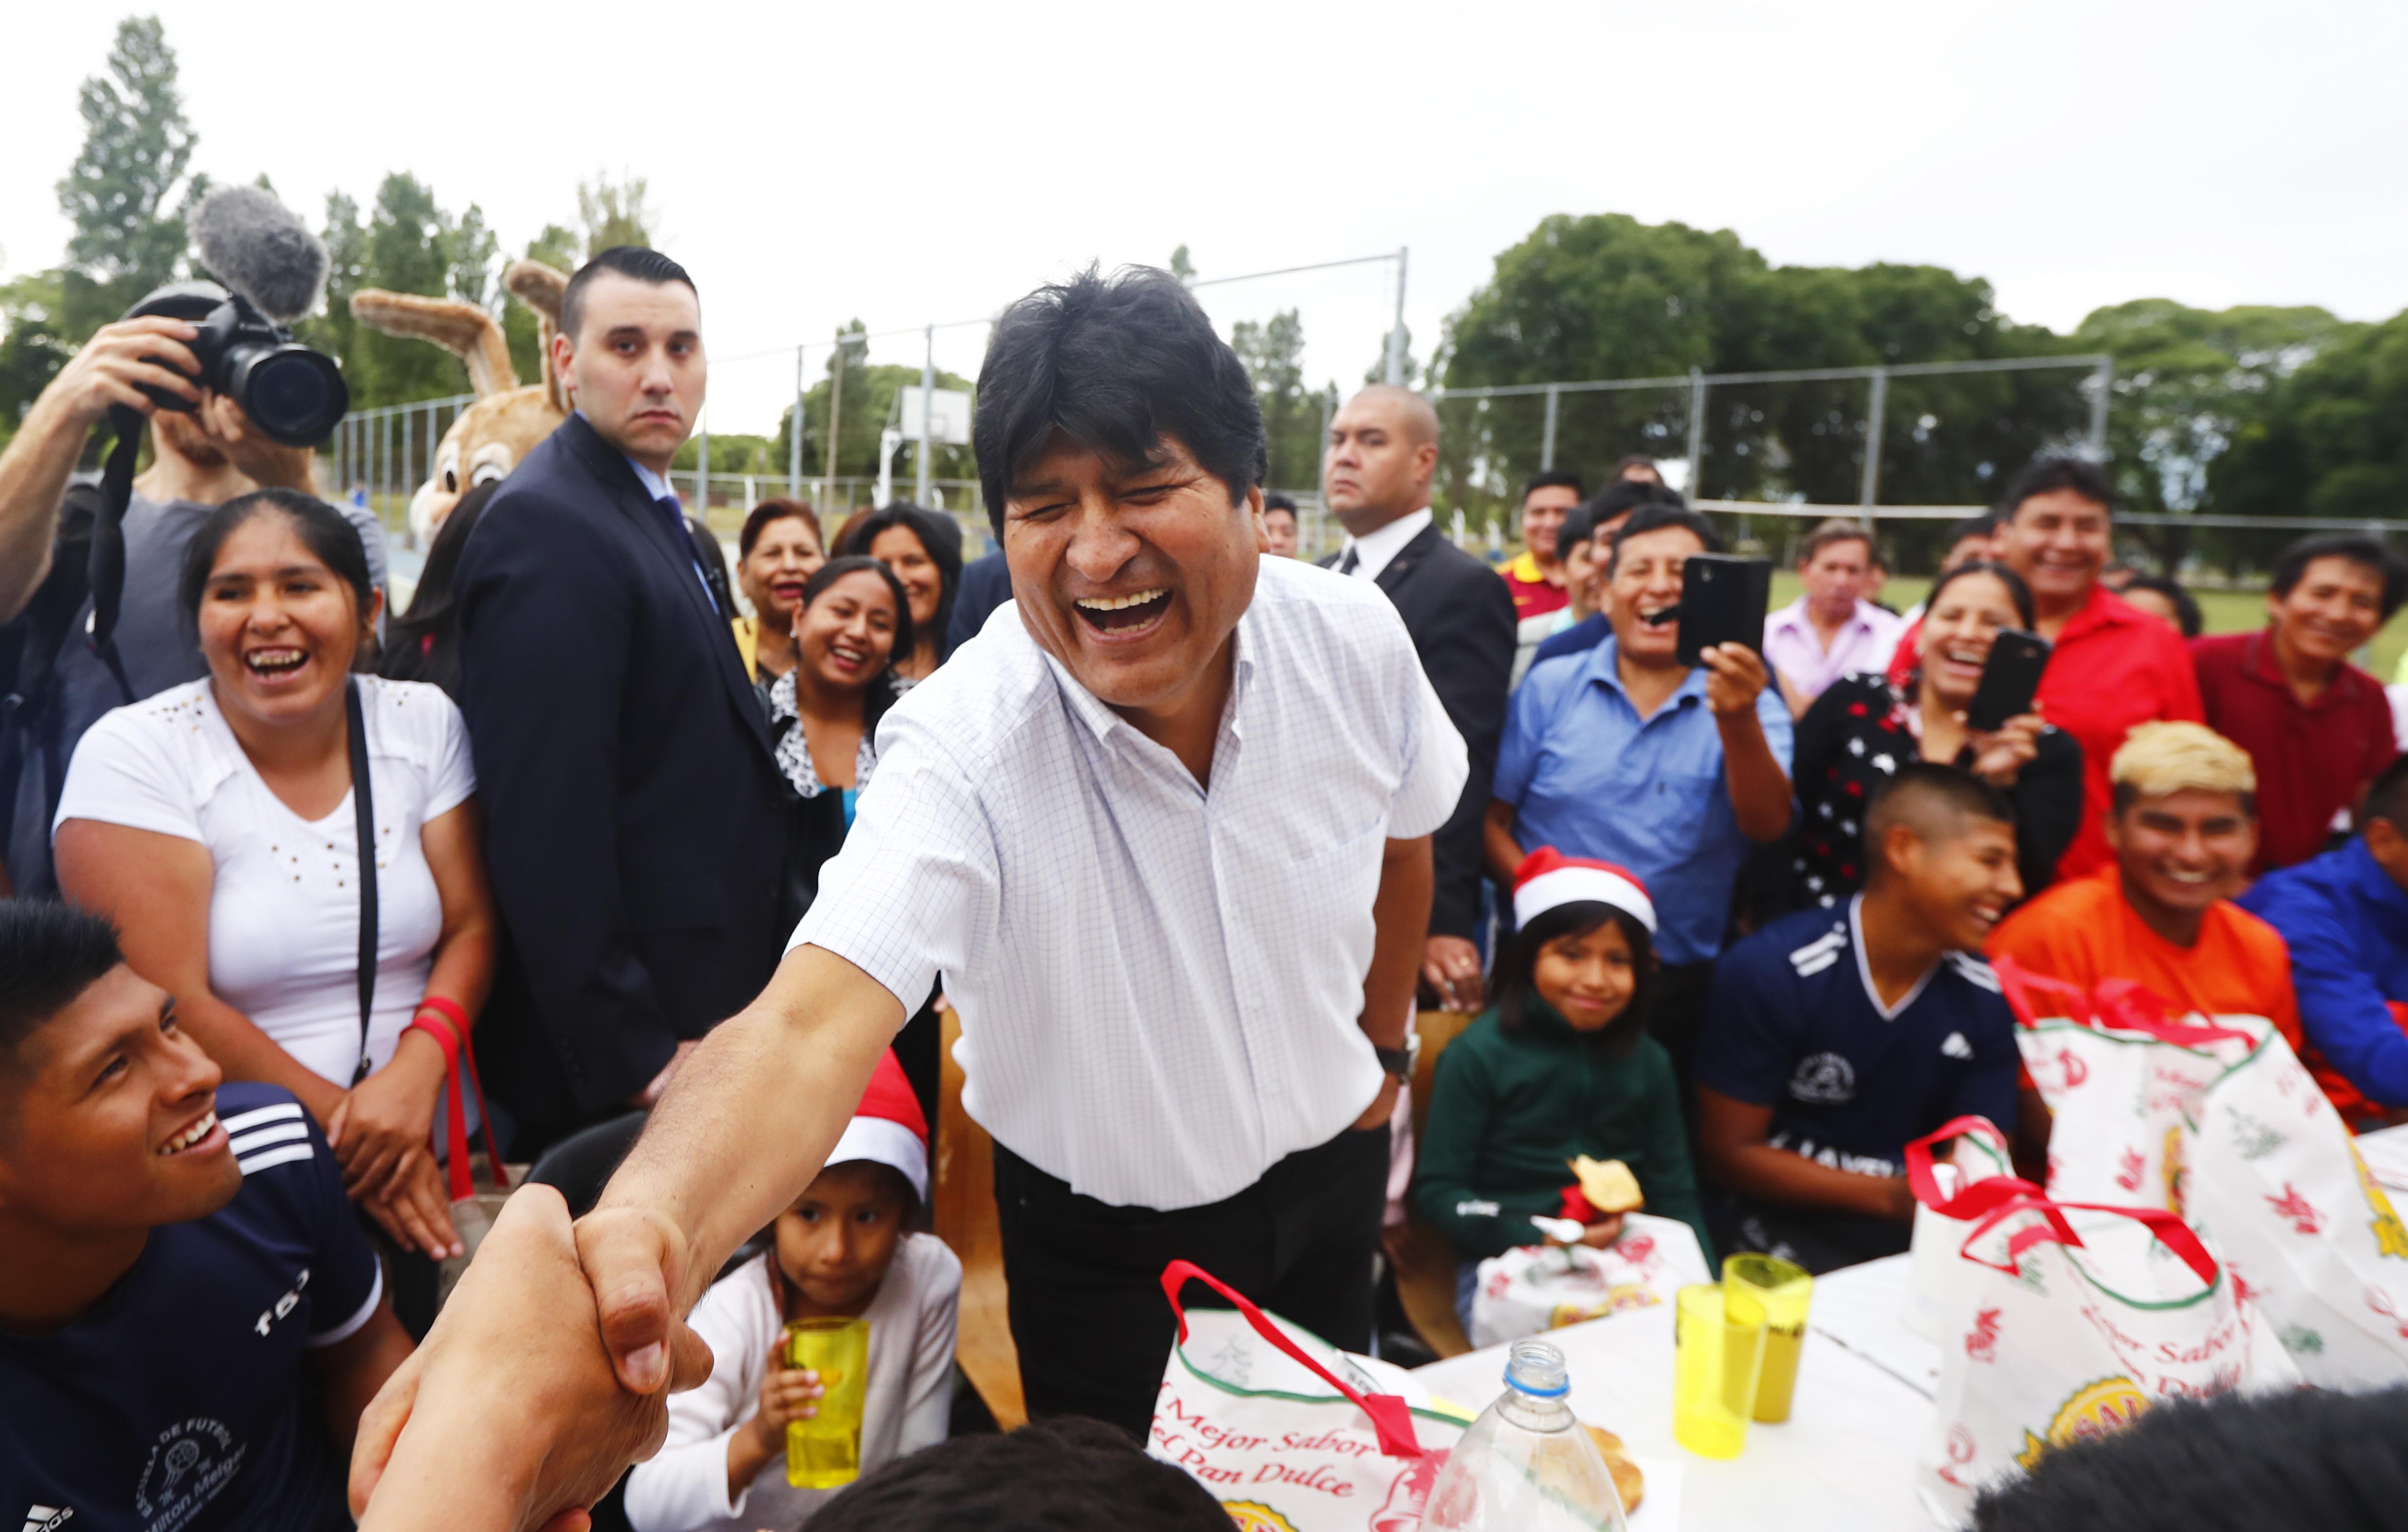 Risking Arrest, Former Bolivian President Evo Morales Expresses Interest in Running for Parliament